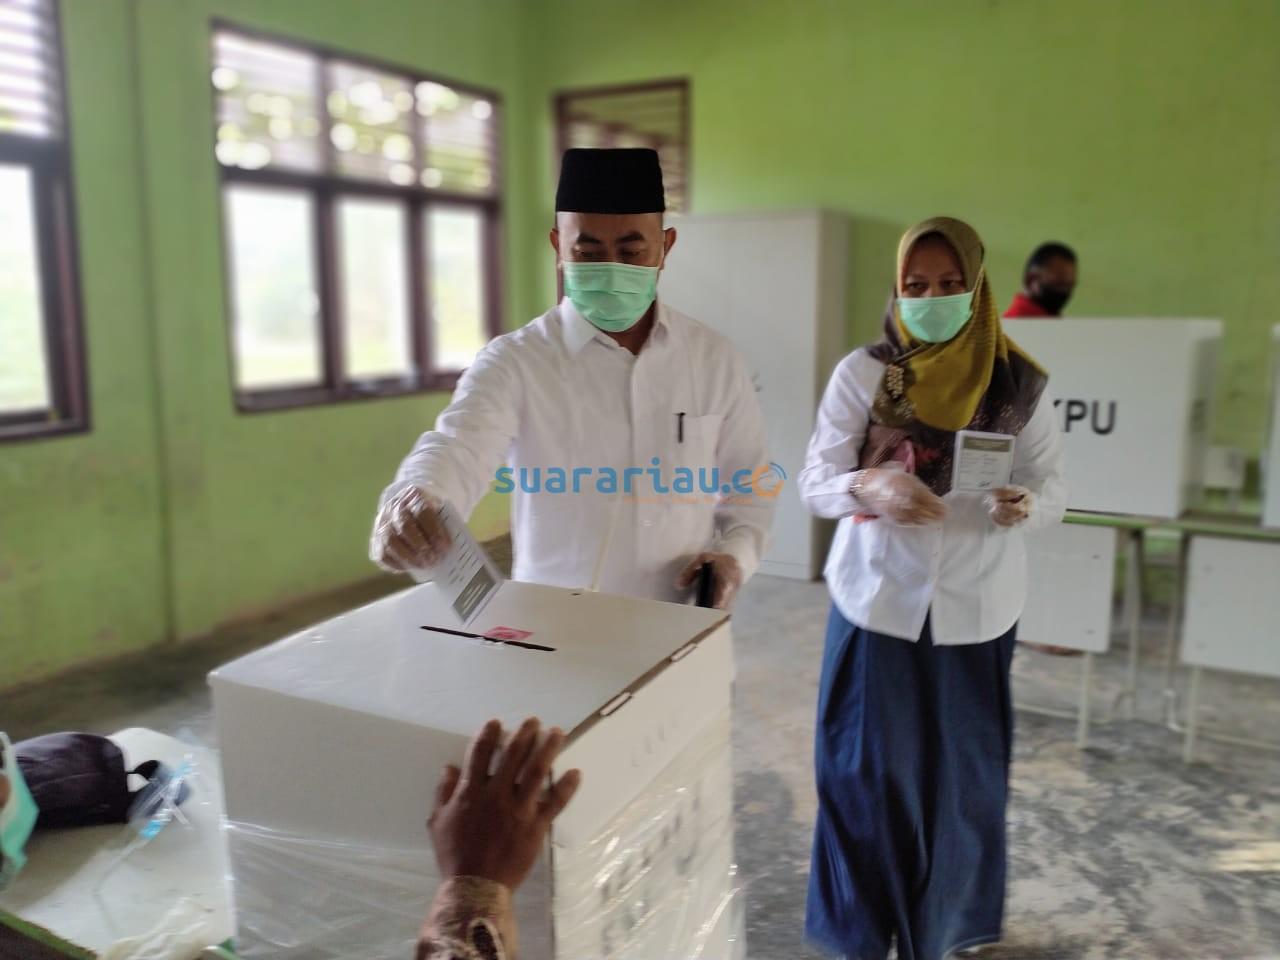 Calon Wakil Bupati Siak Sujarwo memasukkan surat suara ke kotak suara usai menggunakan hak pilih di TPS 1 Kampung Benteng Hilir